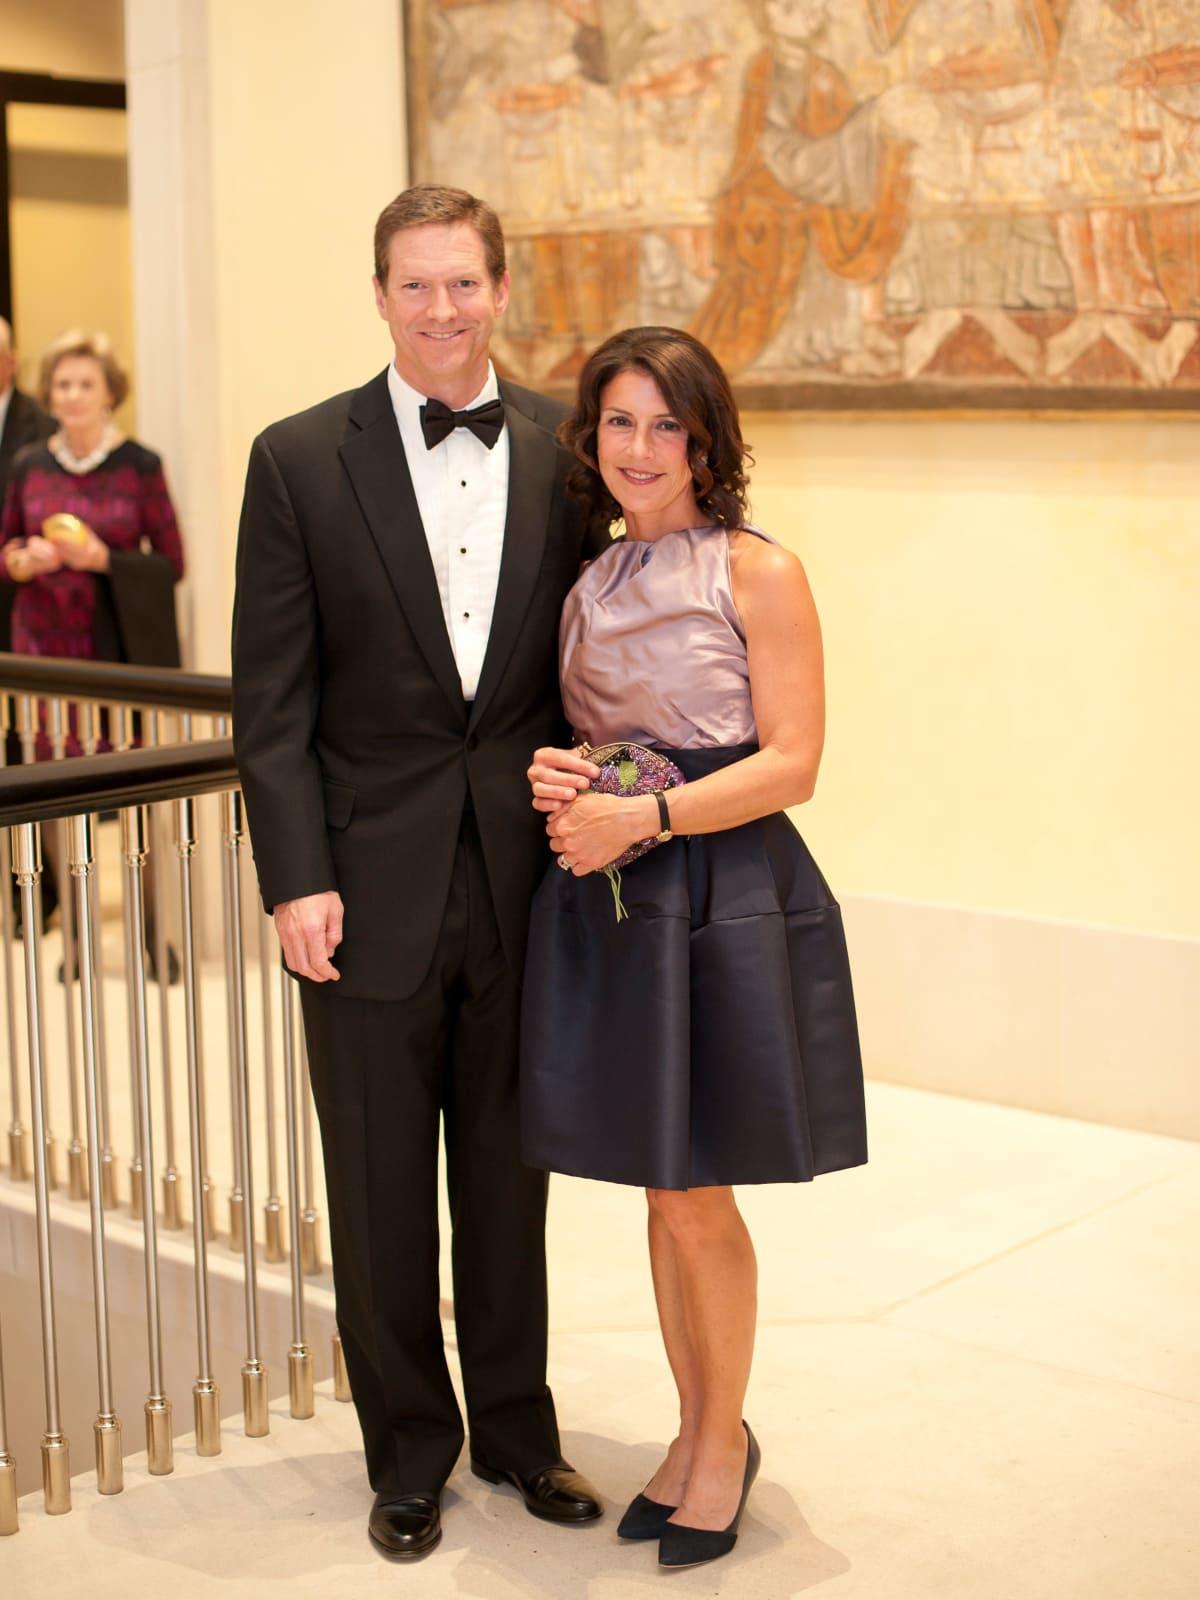 Jay Henry, Pilar Henry, Meadows Museum gala